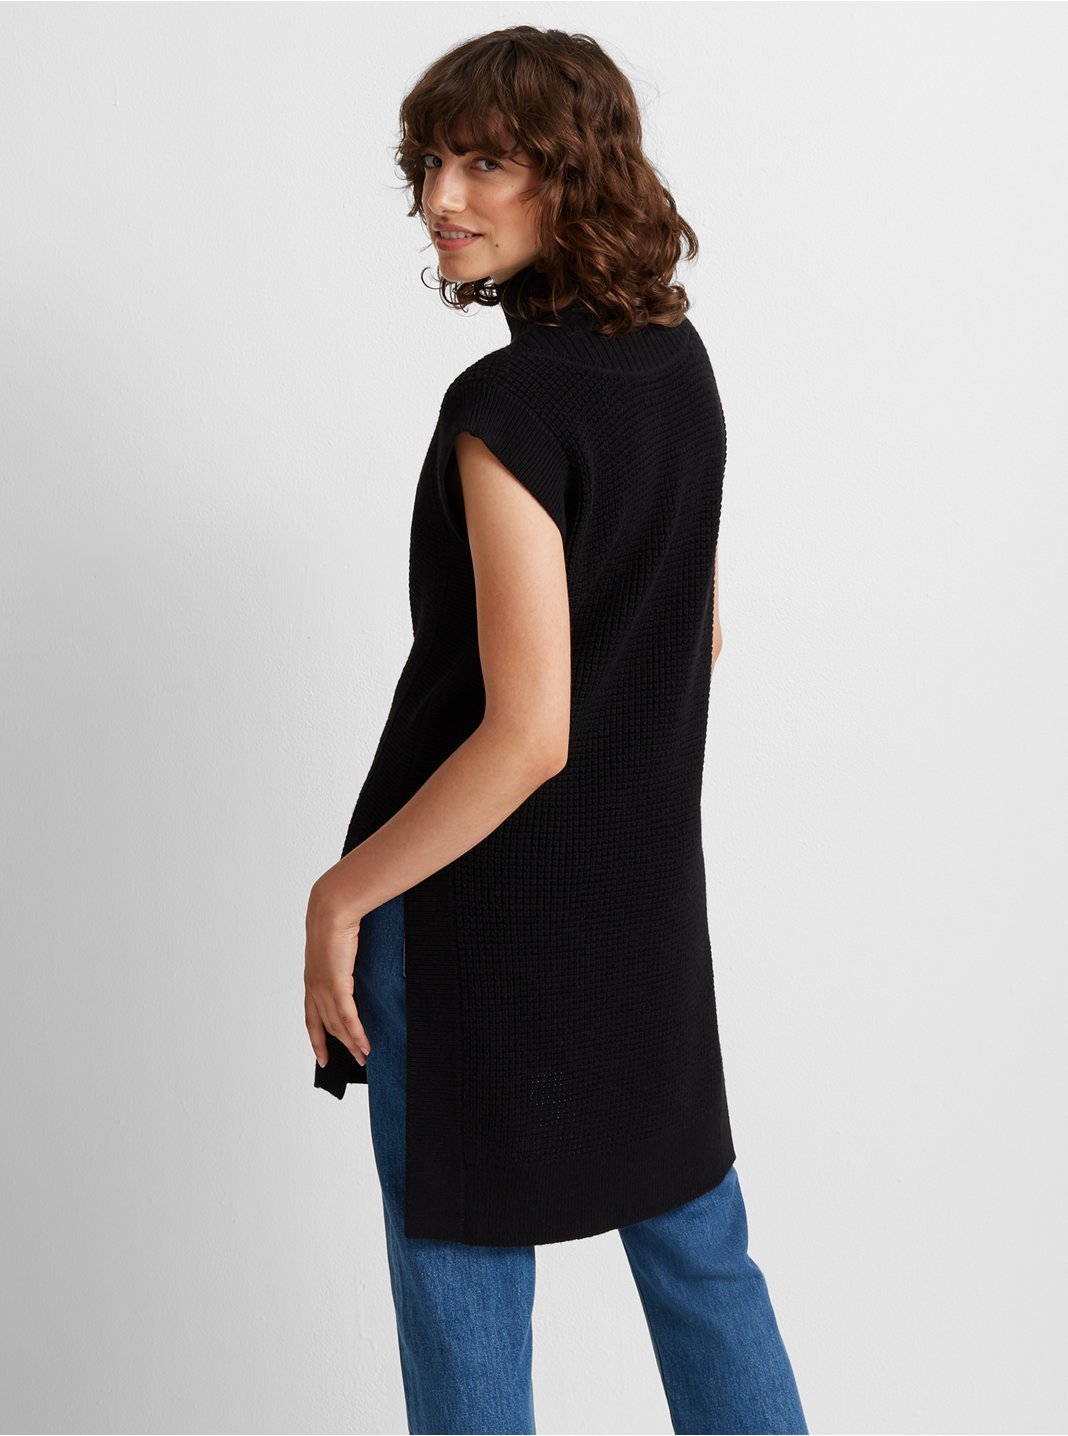 843520de0e0 Women's Sweaters   Club Monaco